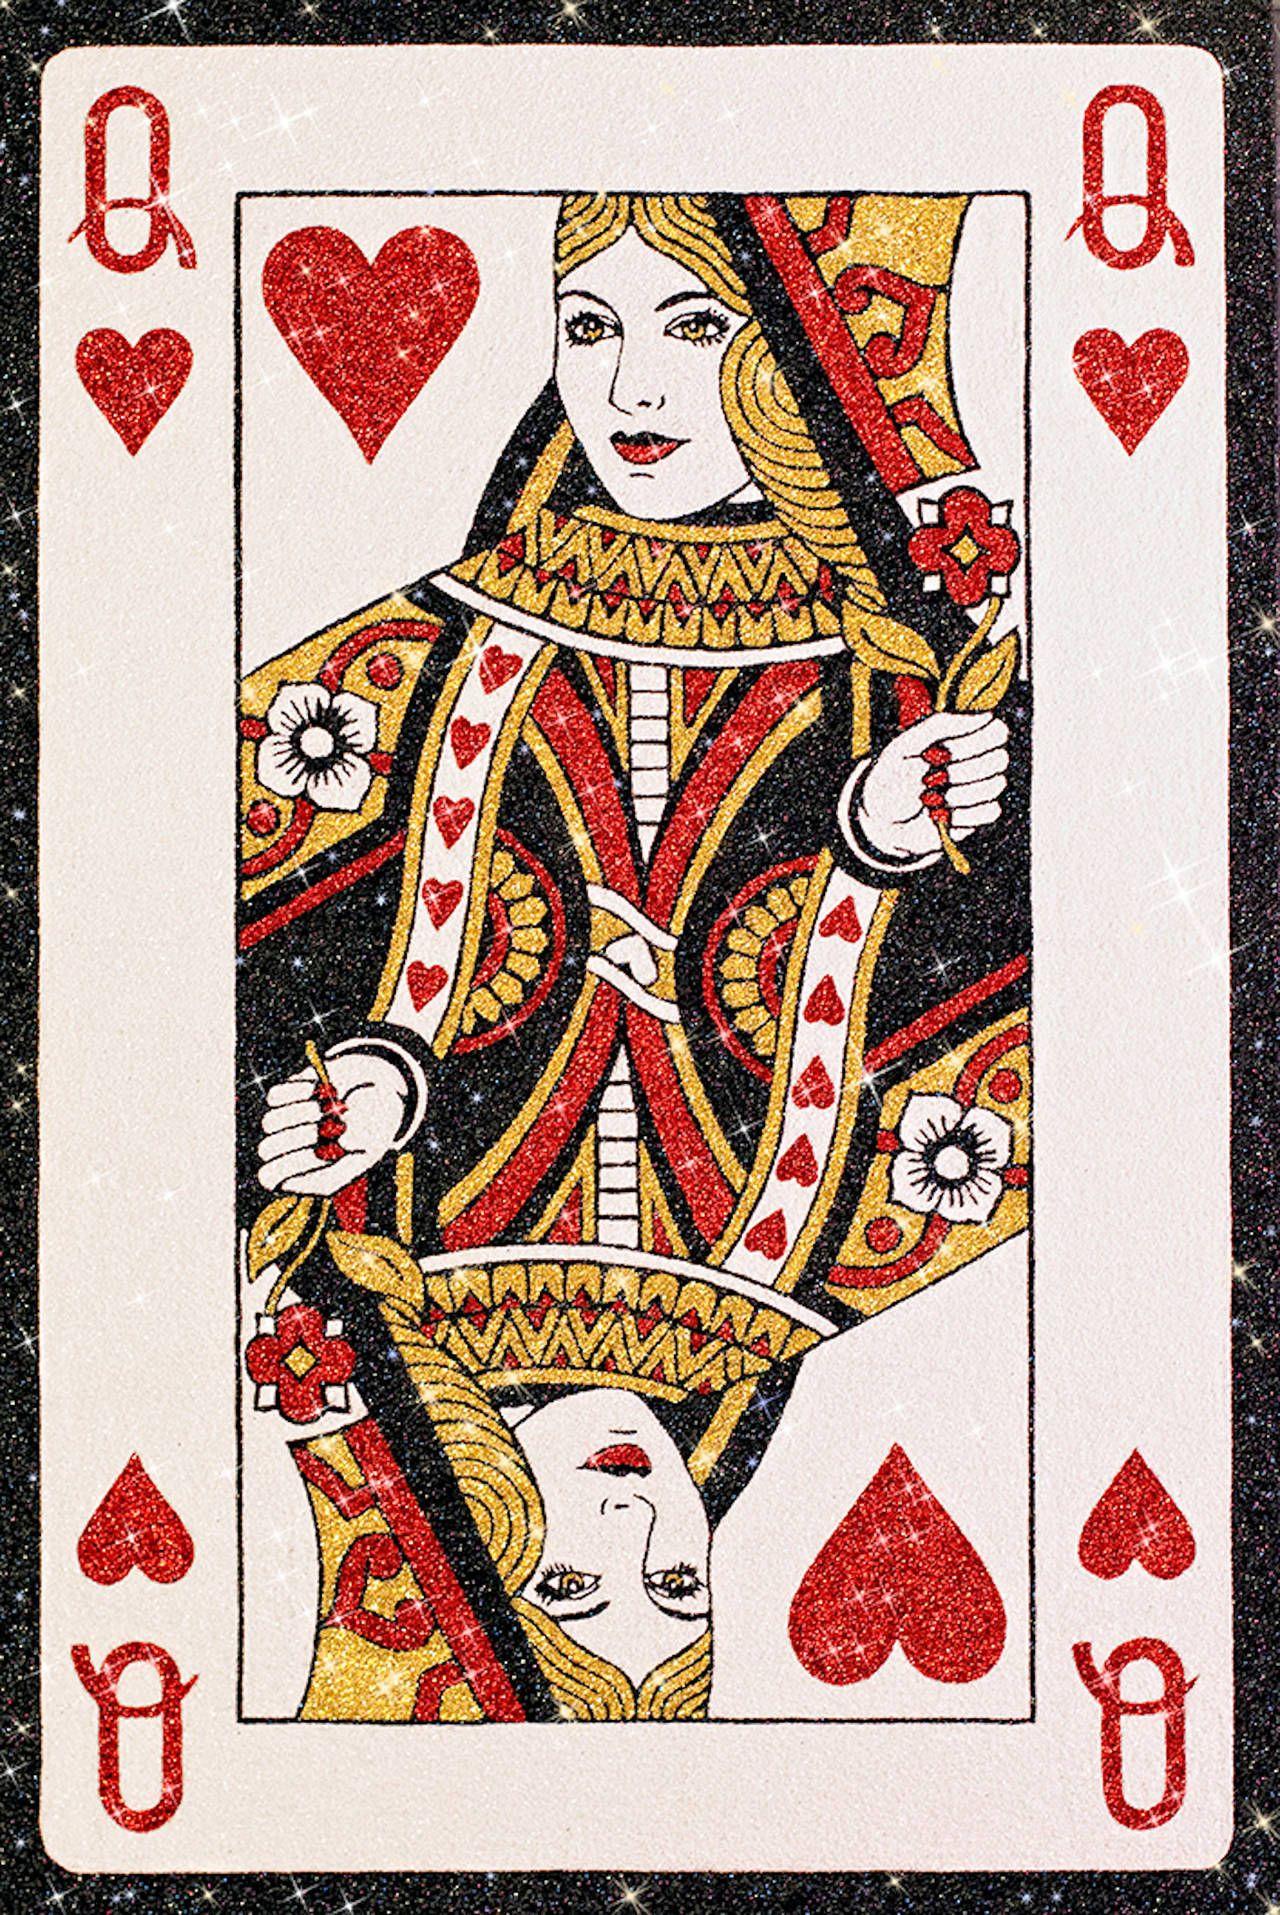 Camomile hixon queen of hearts queen of hearts tattoo